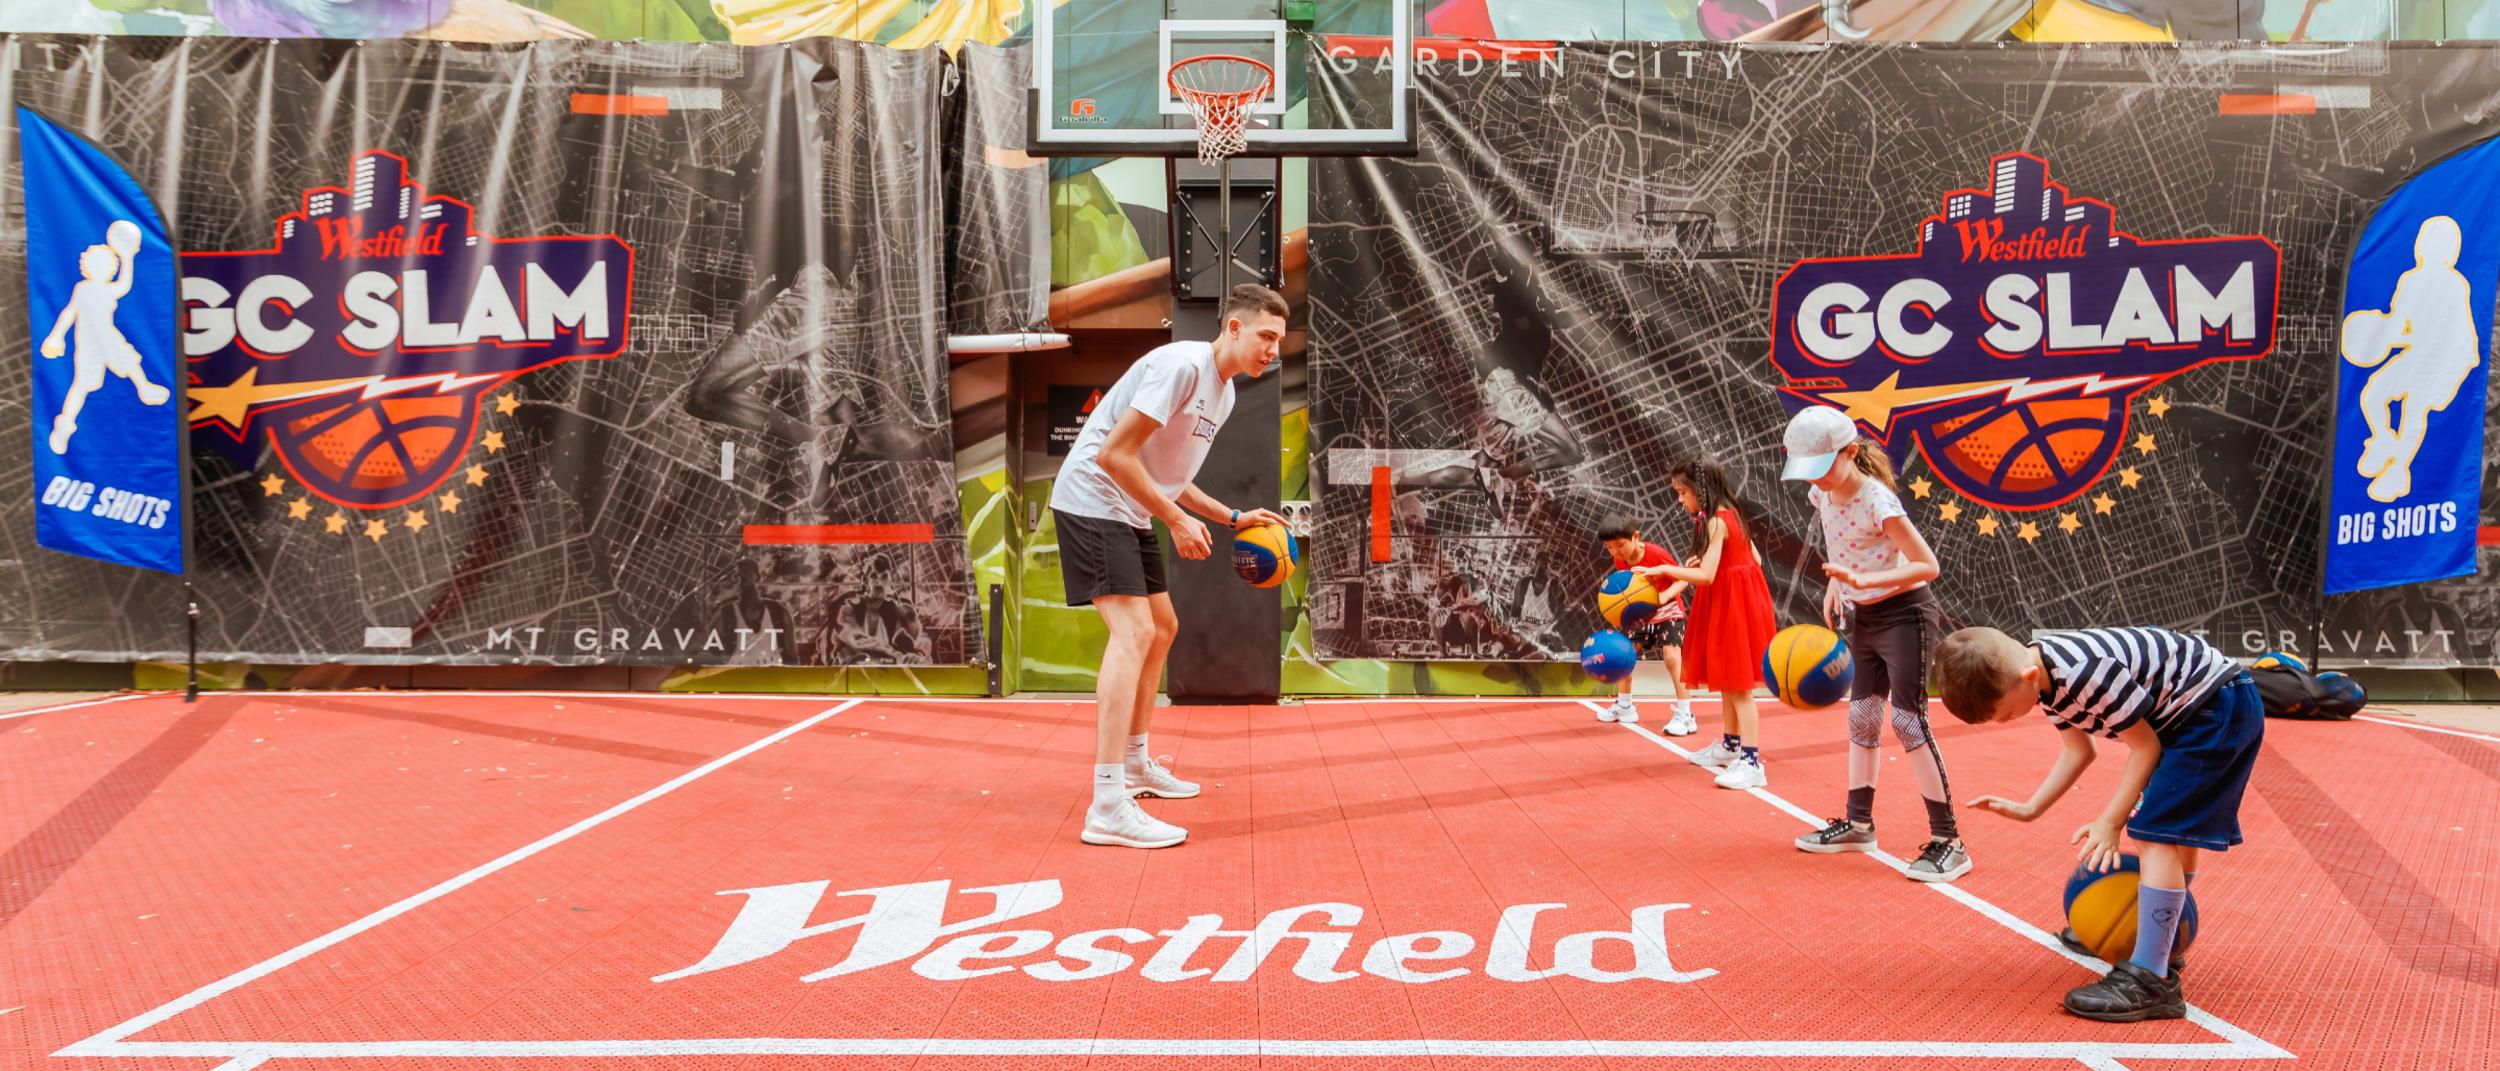 Big Shots Blitz at the GC Slam basketball court